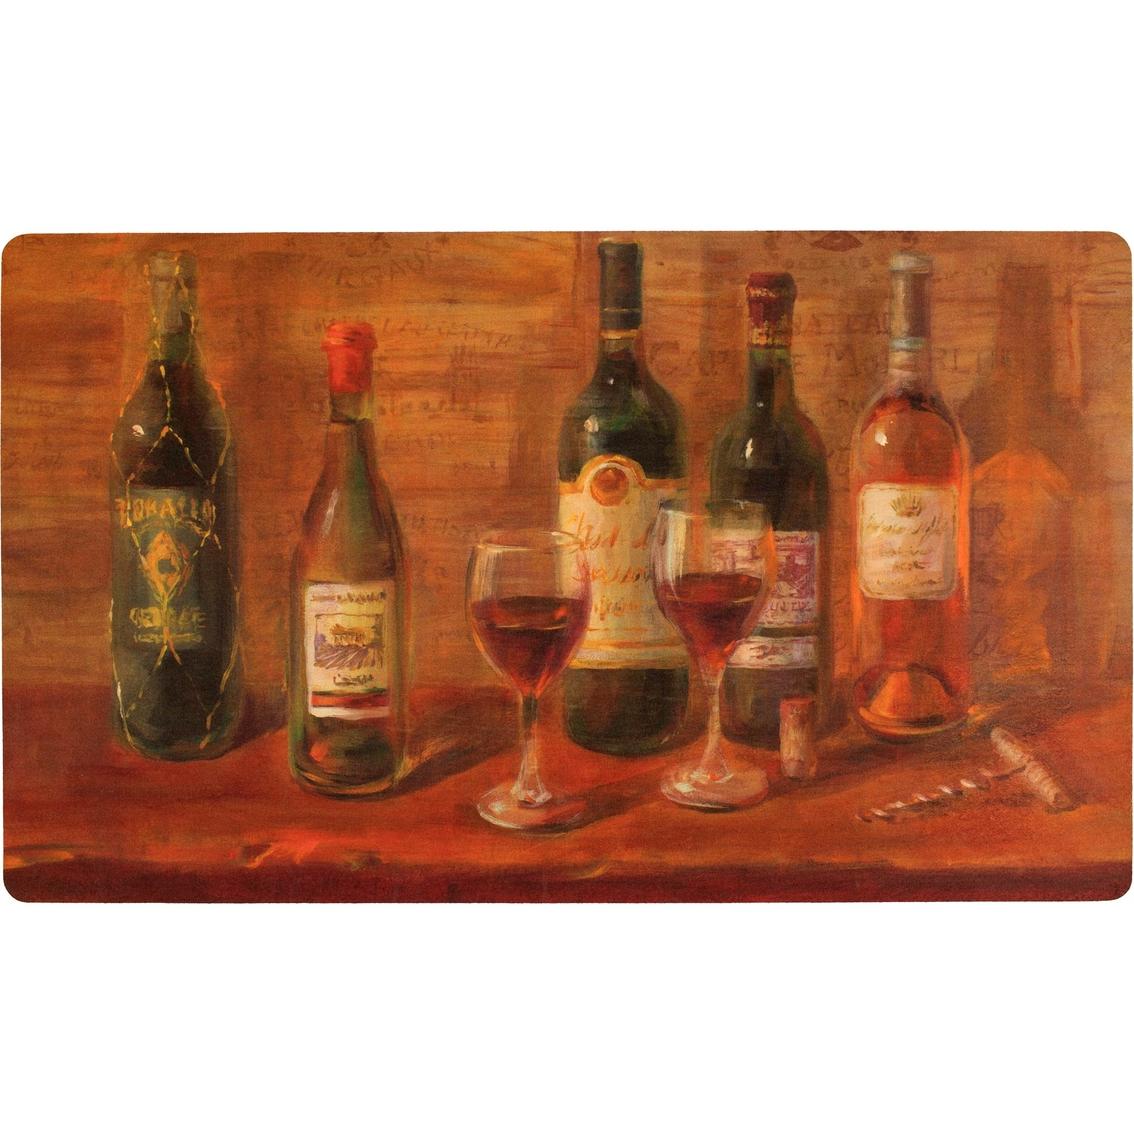 The Tasting Kitchen: Mohawk Home Wine Tasting Table Kitchen Mat 18x30